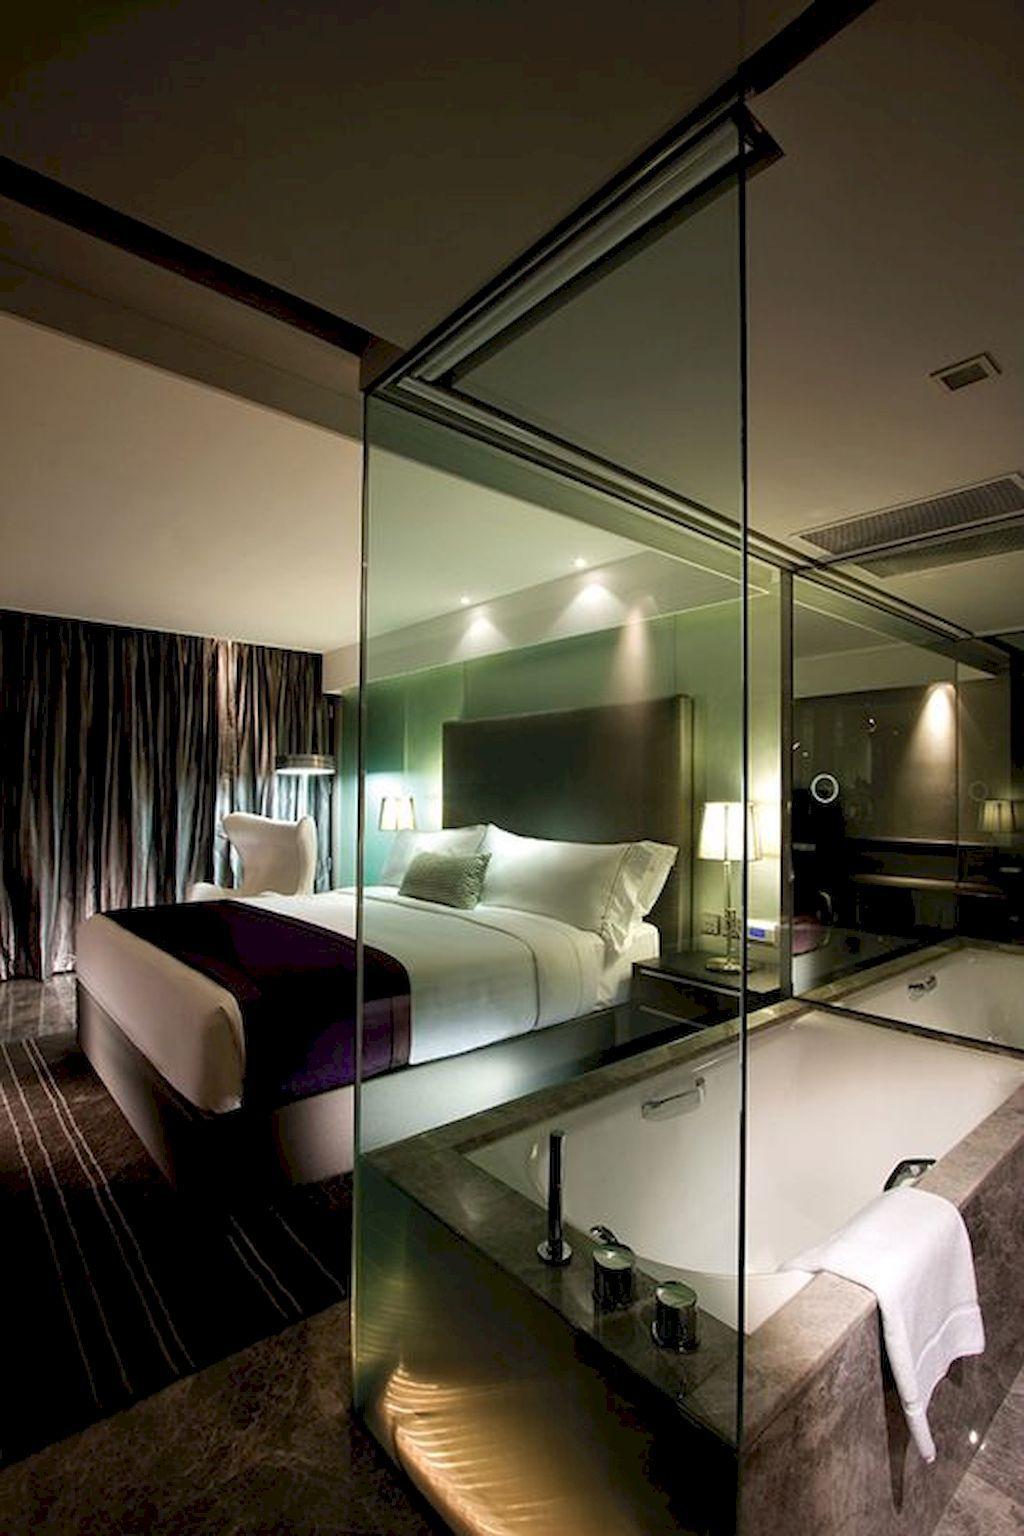 Romantic Hotel Room Ideas: 60 Romantic Master Bedroom Decor Ideas